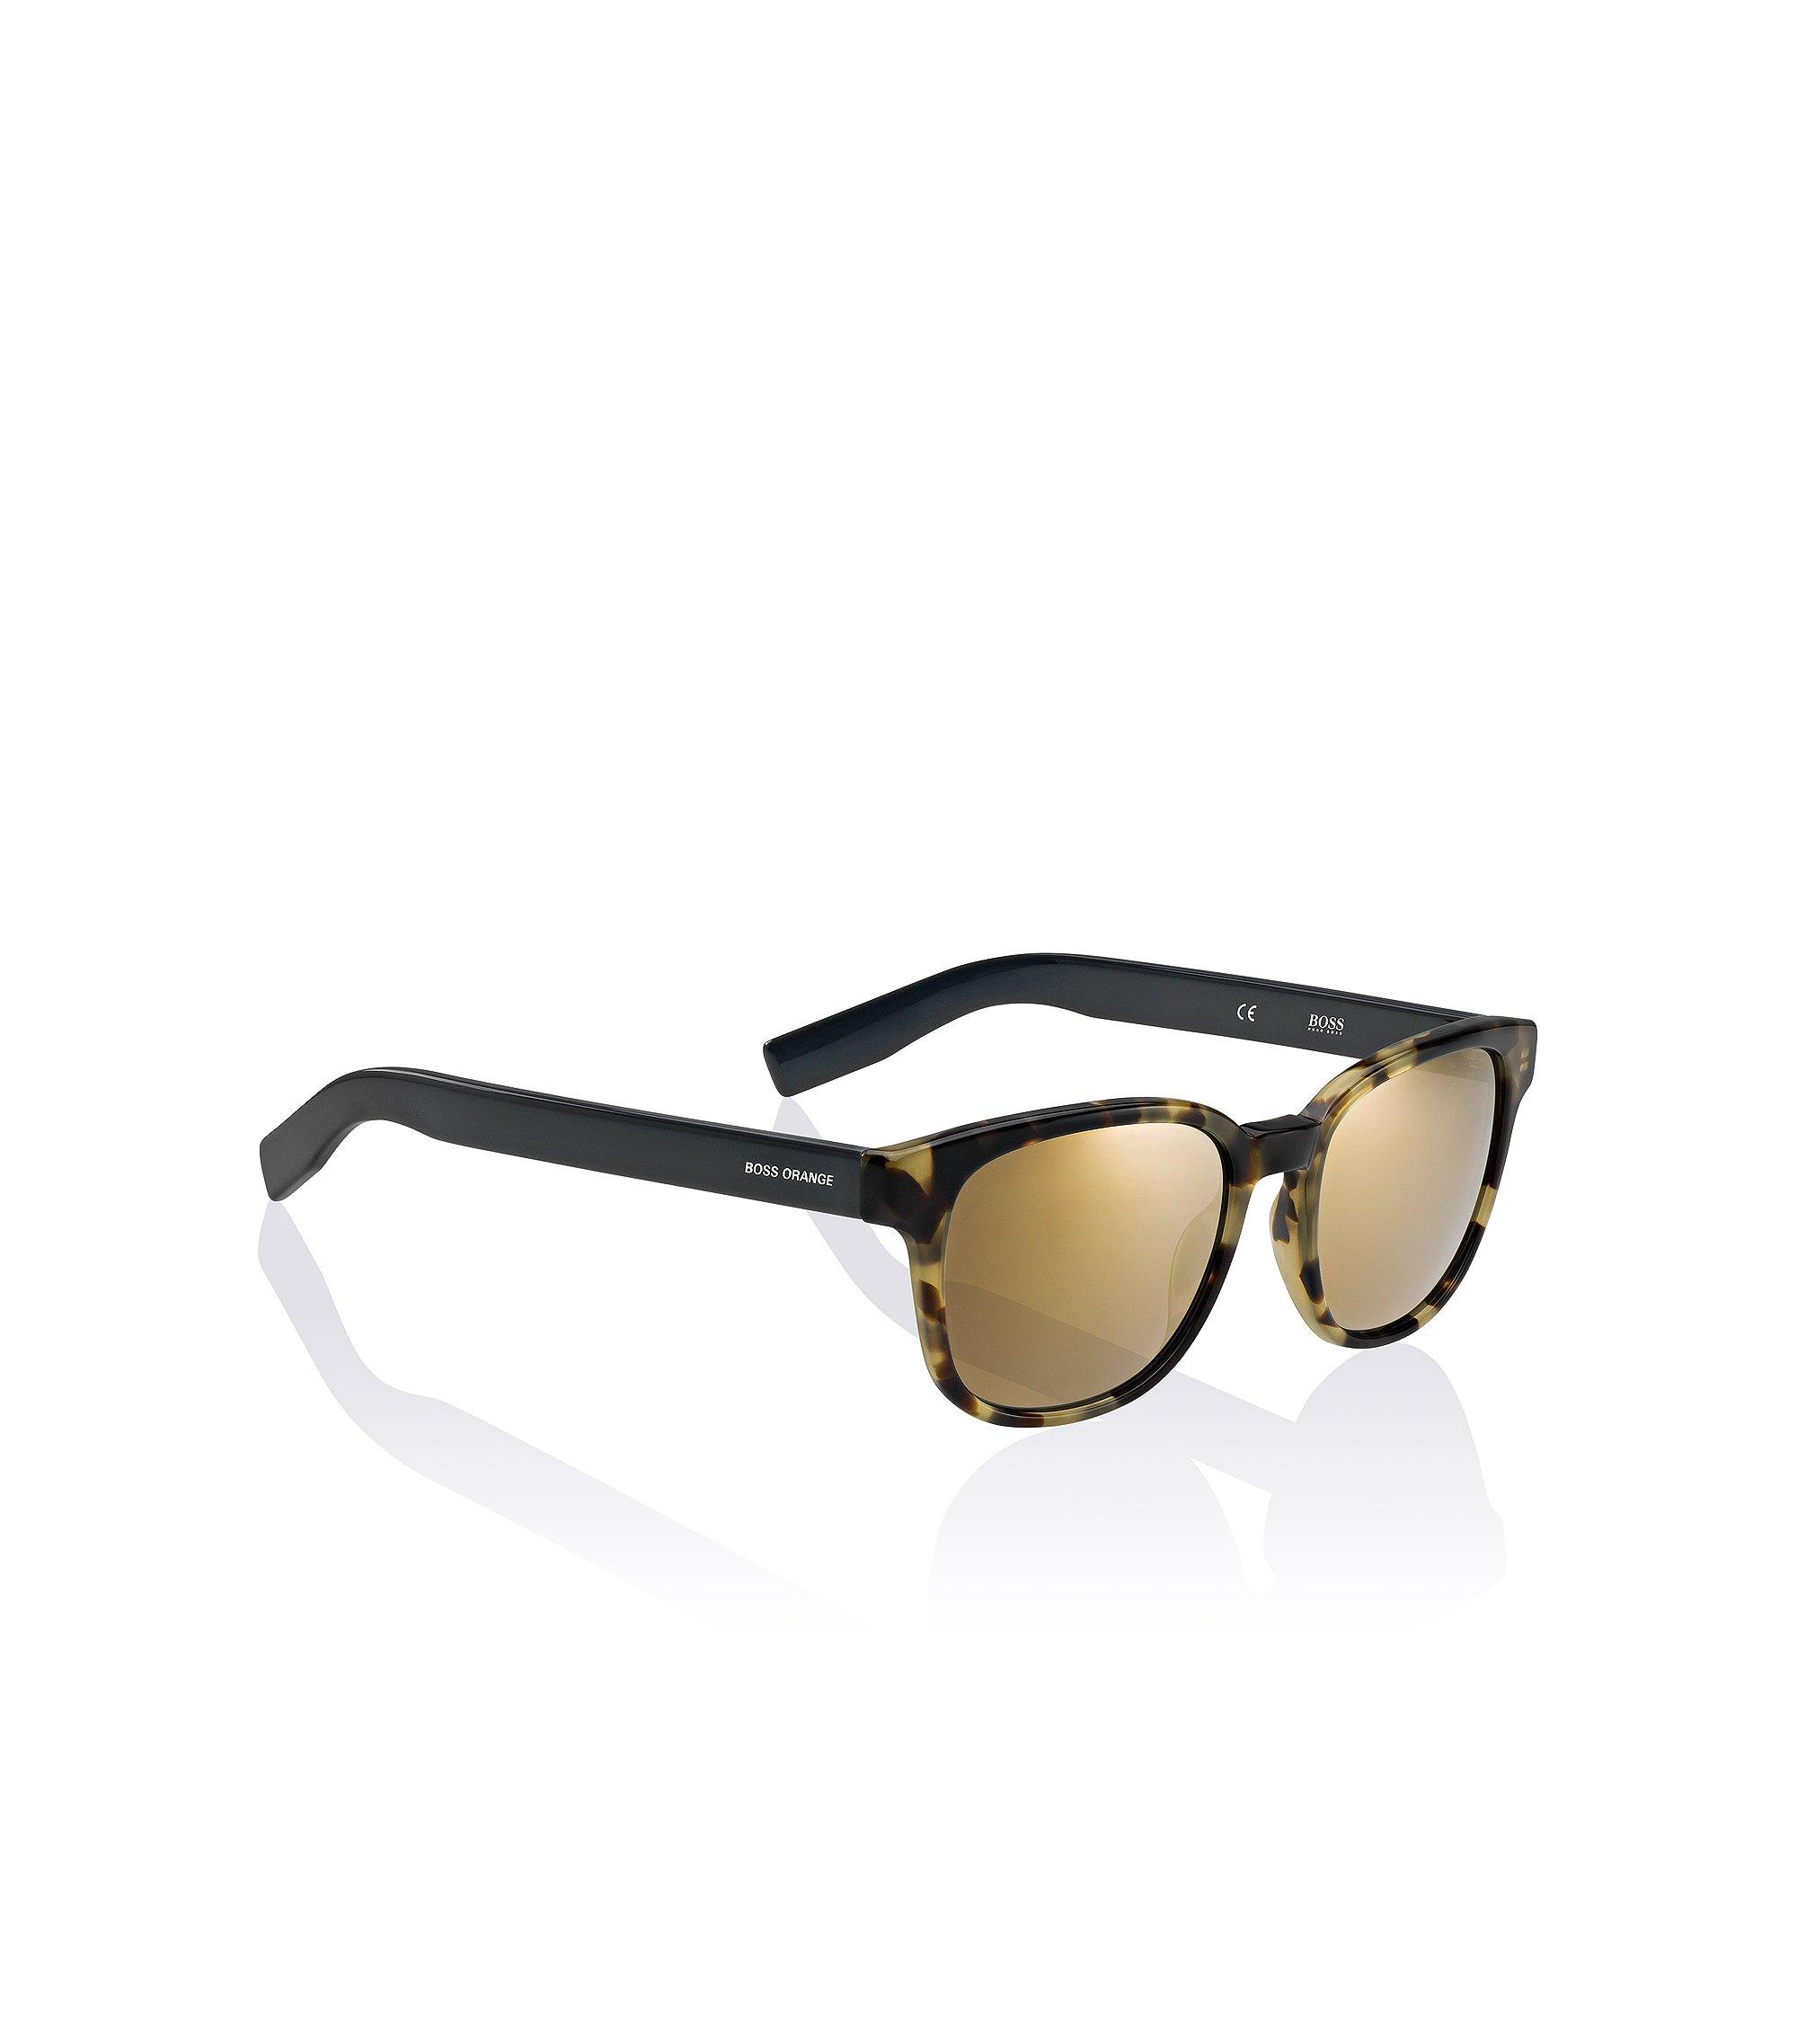 Wayfarer-zonnebril 'BO 0193', Assorted-Pre-Pack